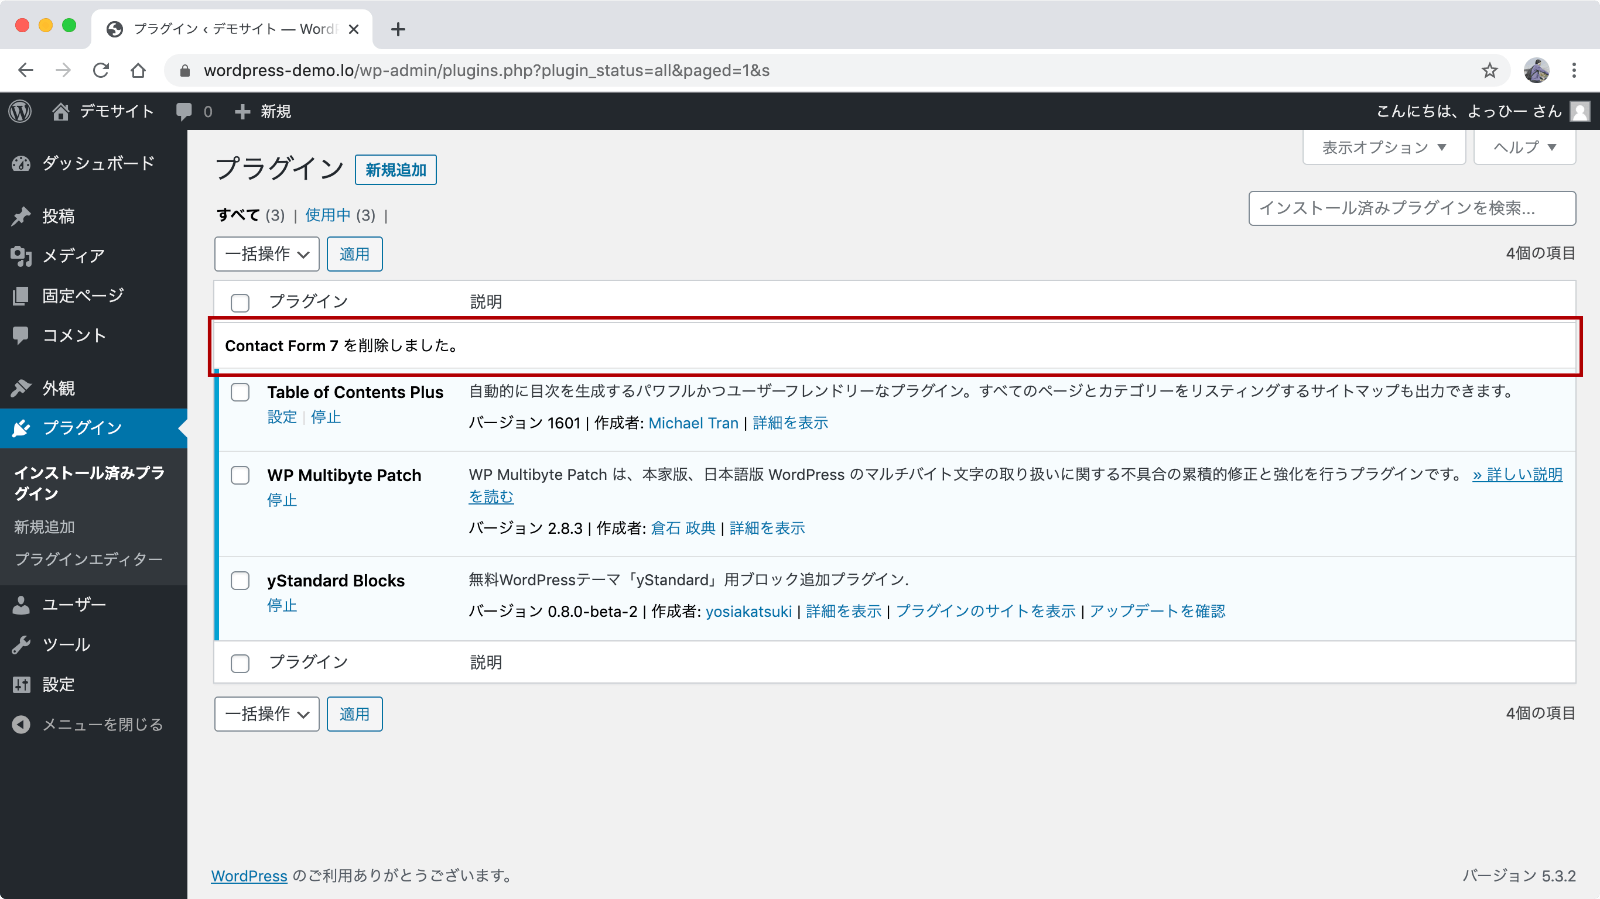 WordPressプラグインの削除完了